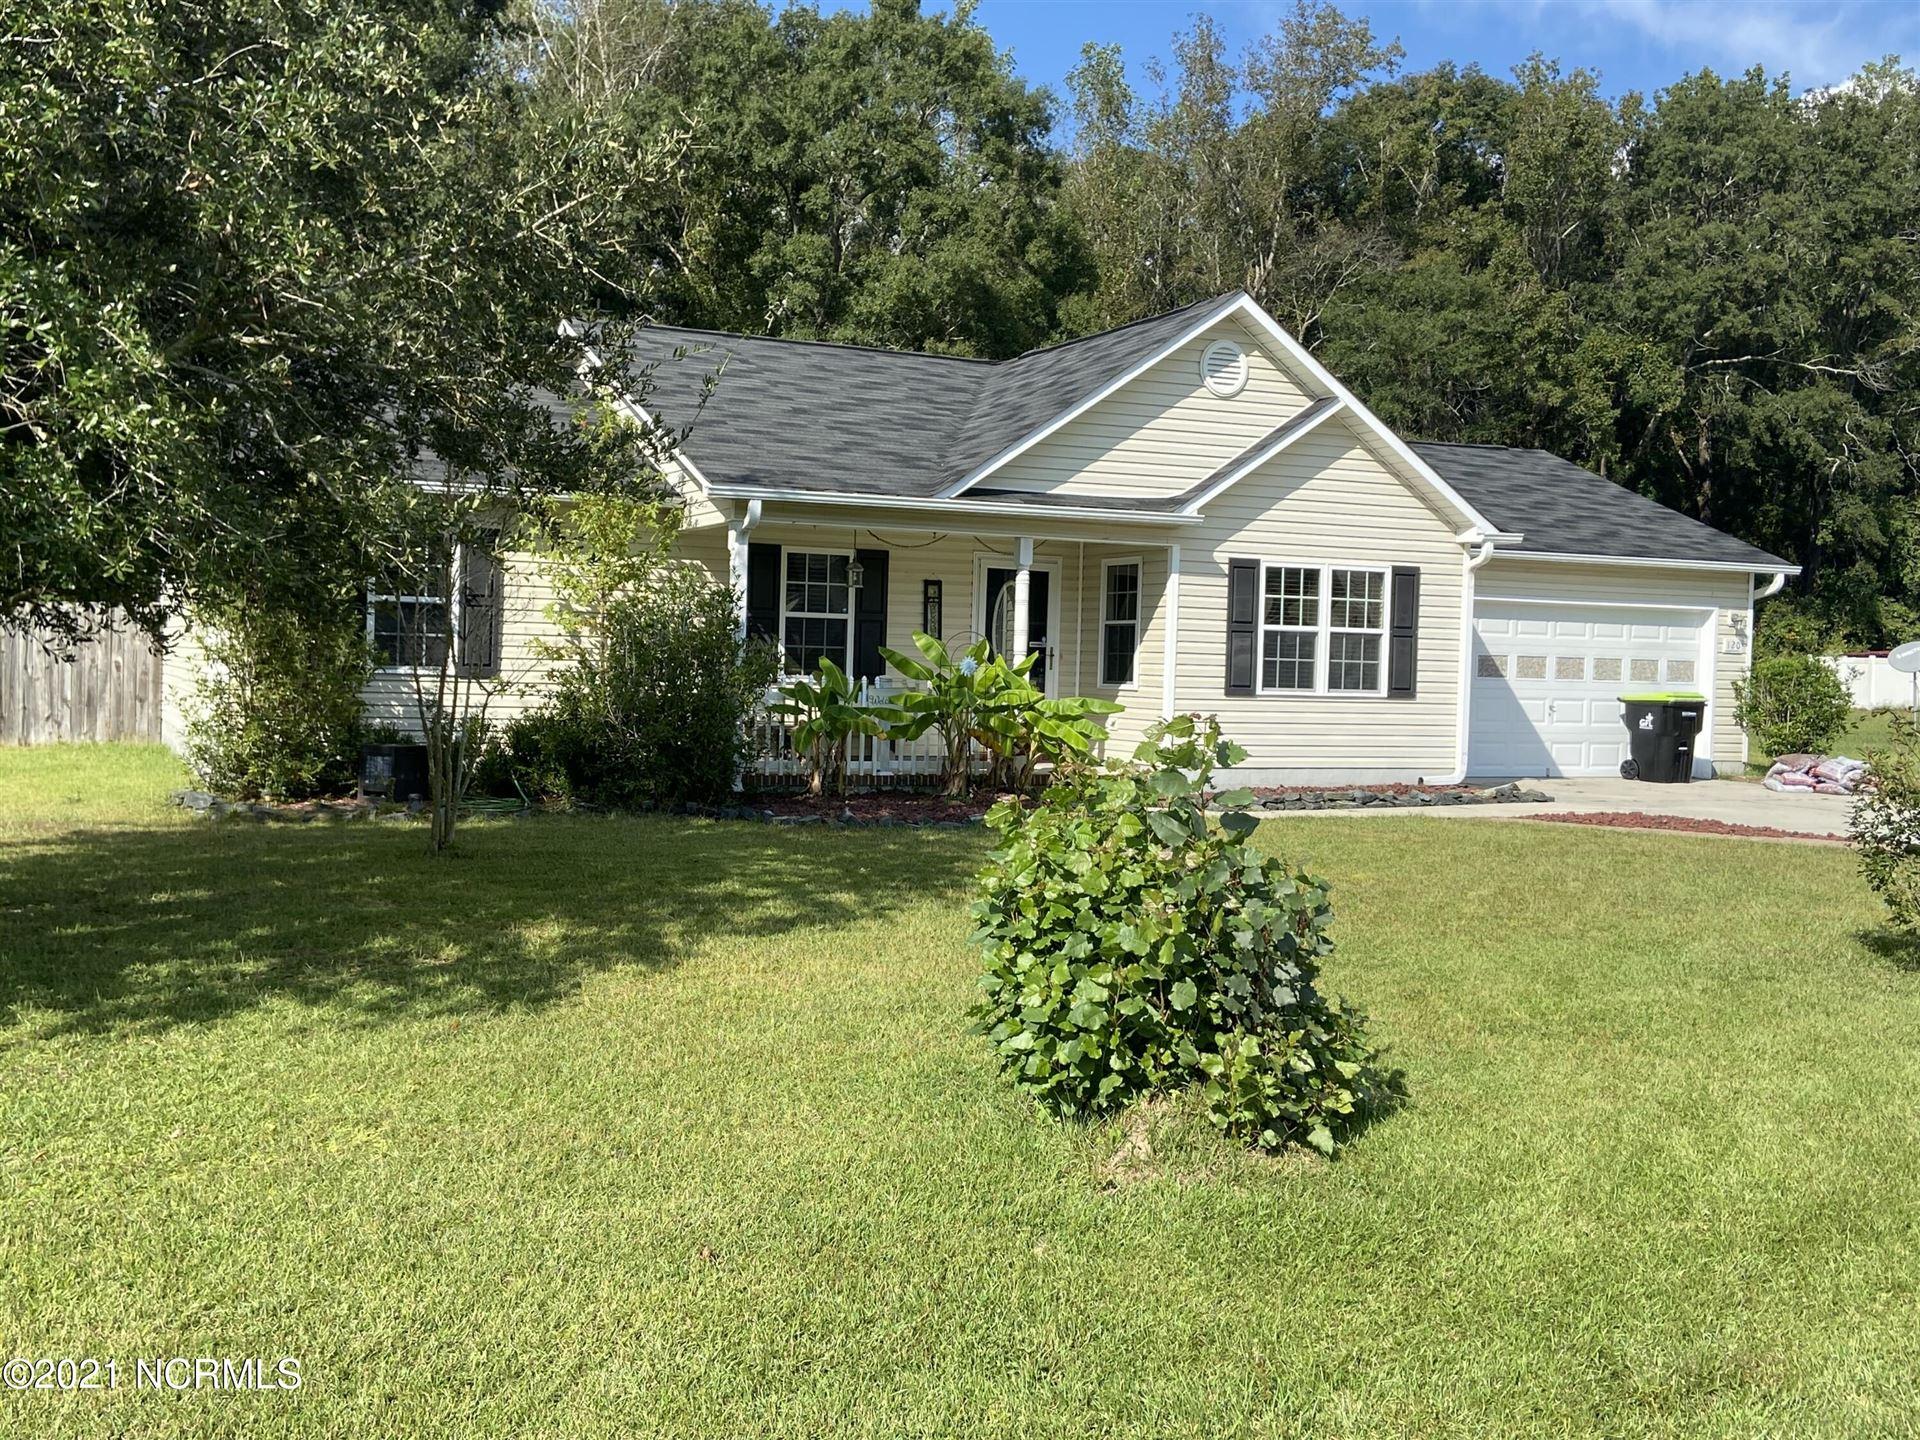 Photo of 120 Pear Tree Lane, Richlands, NC 28574 (MLS # 100295100)